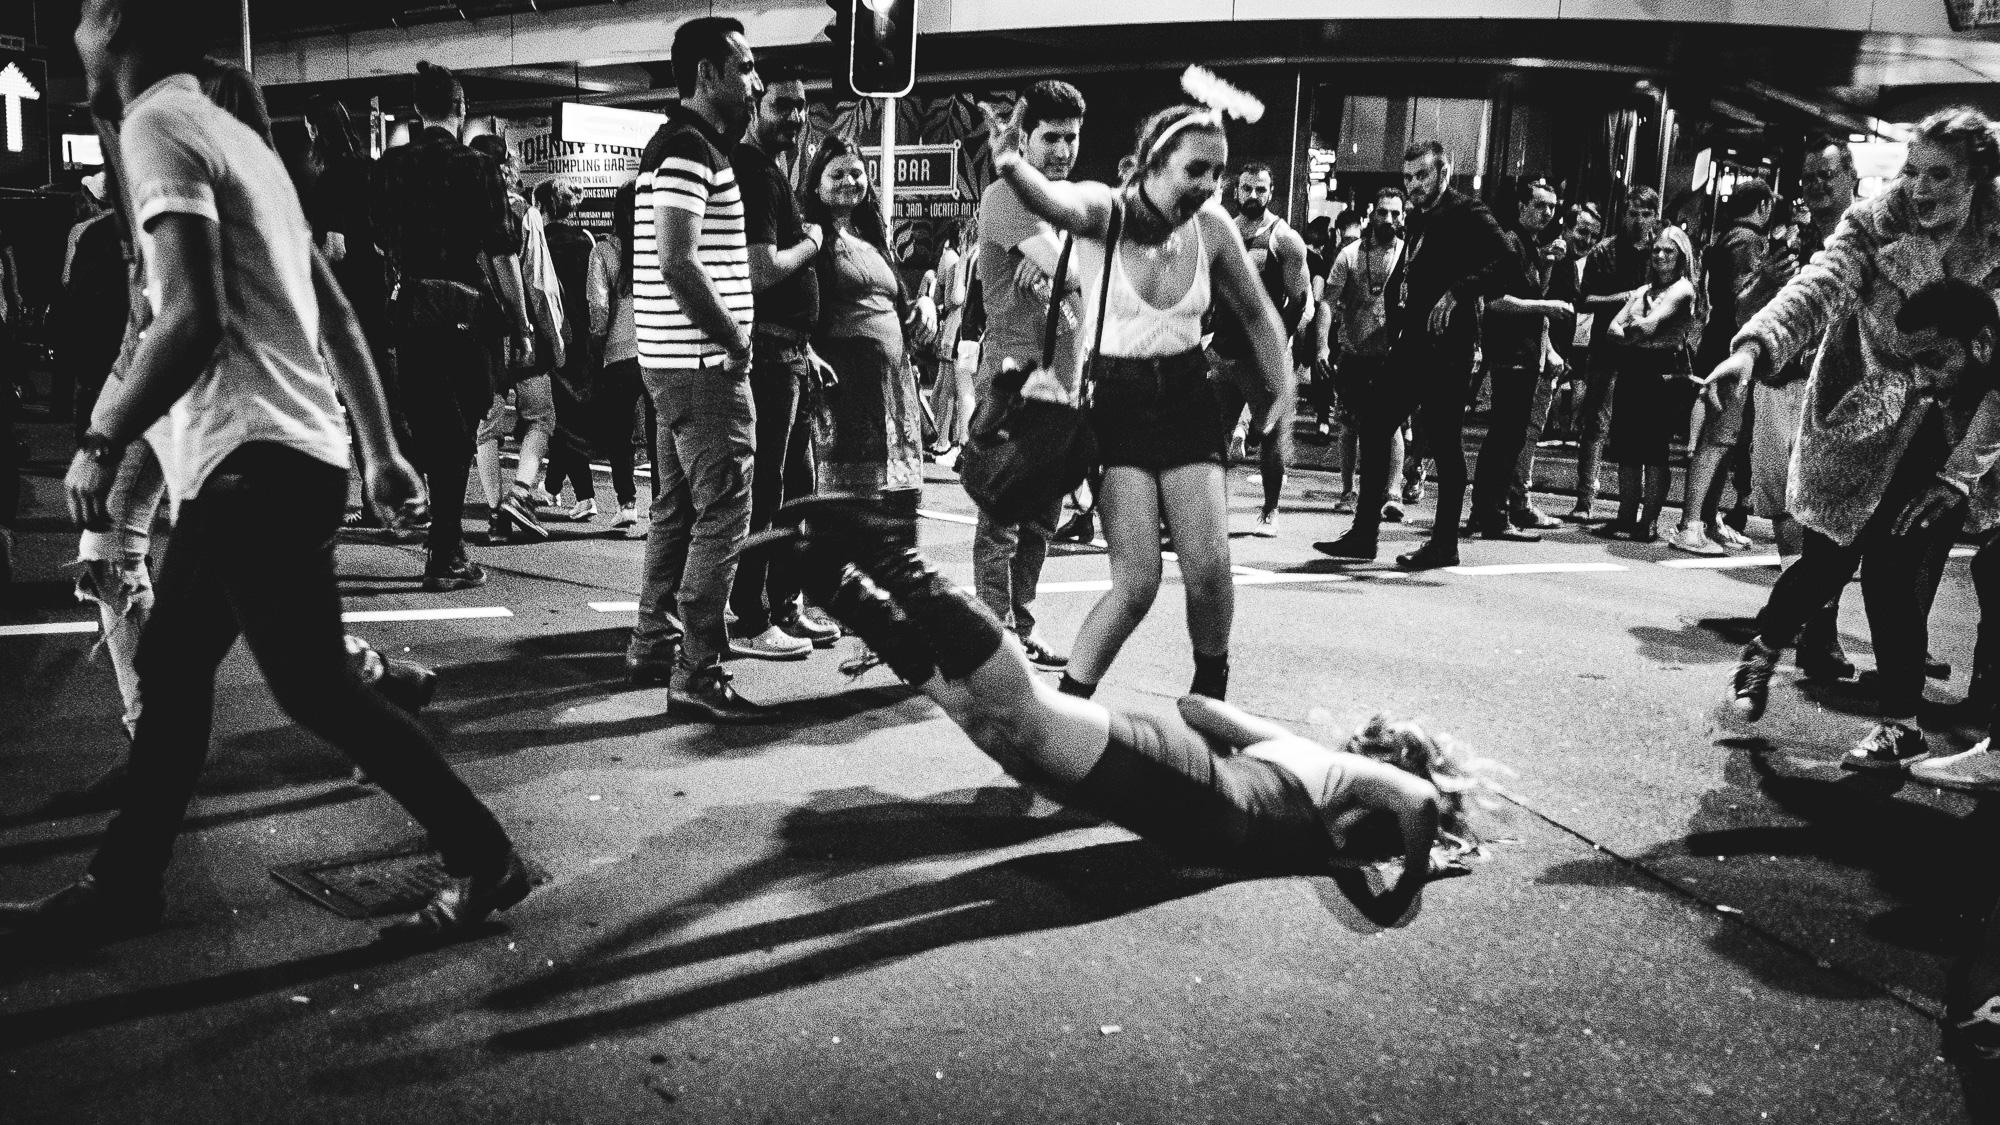 Sydney Mardi Gras 2017 - Street Photography